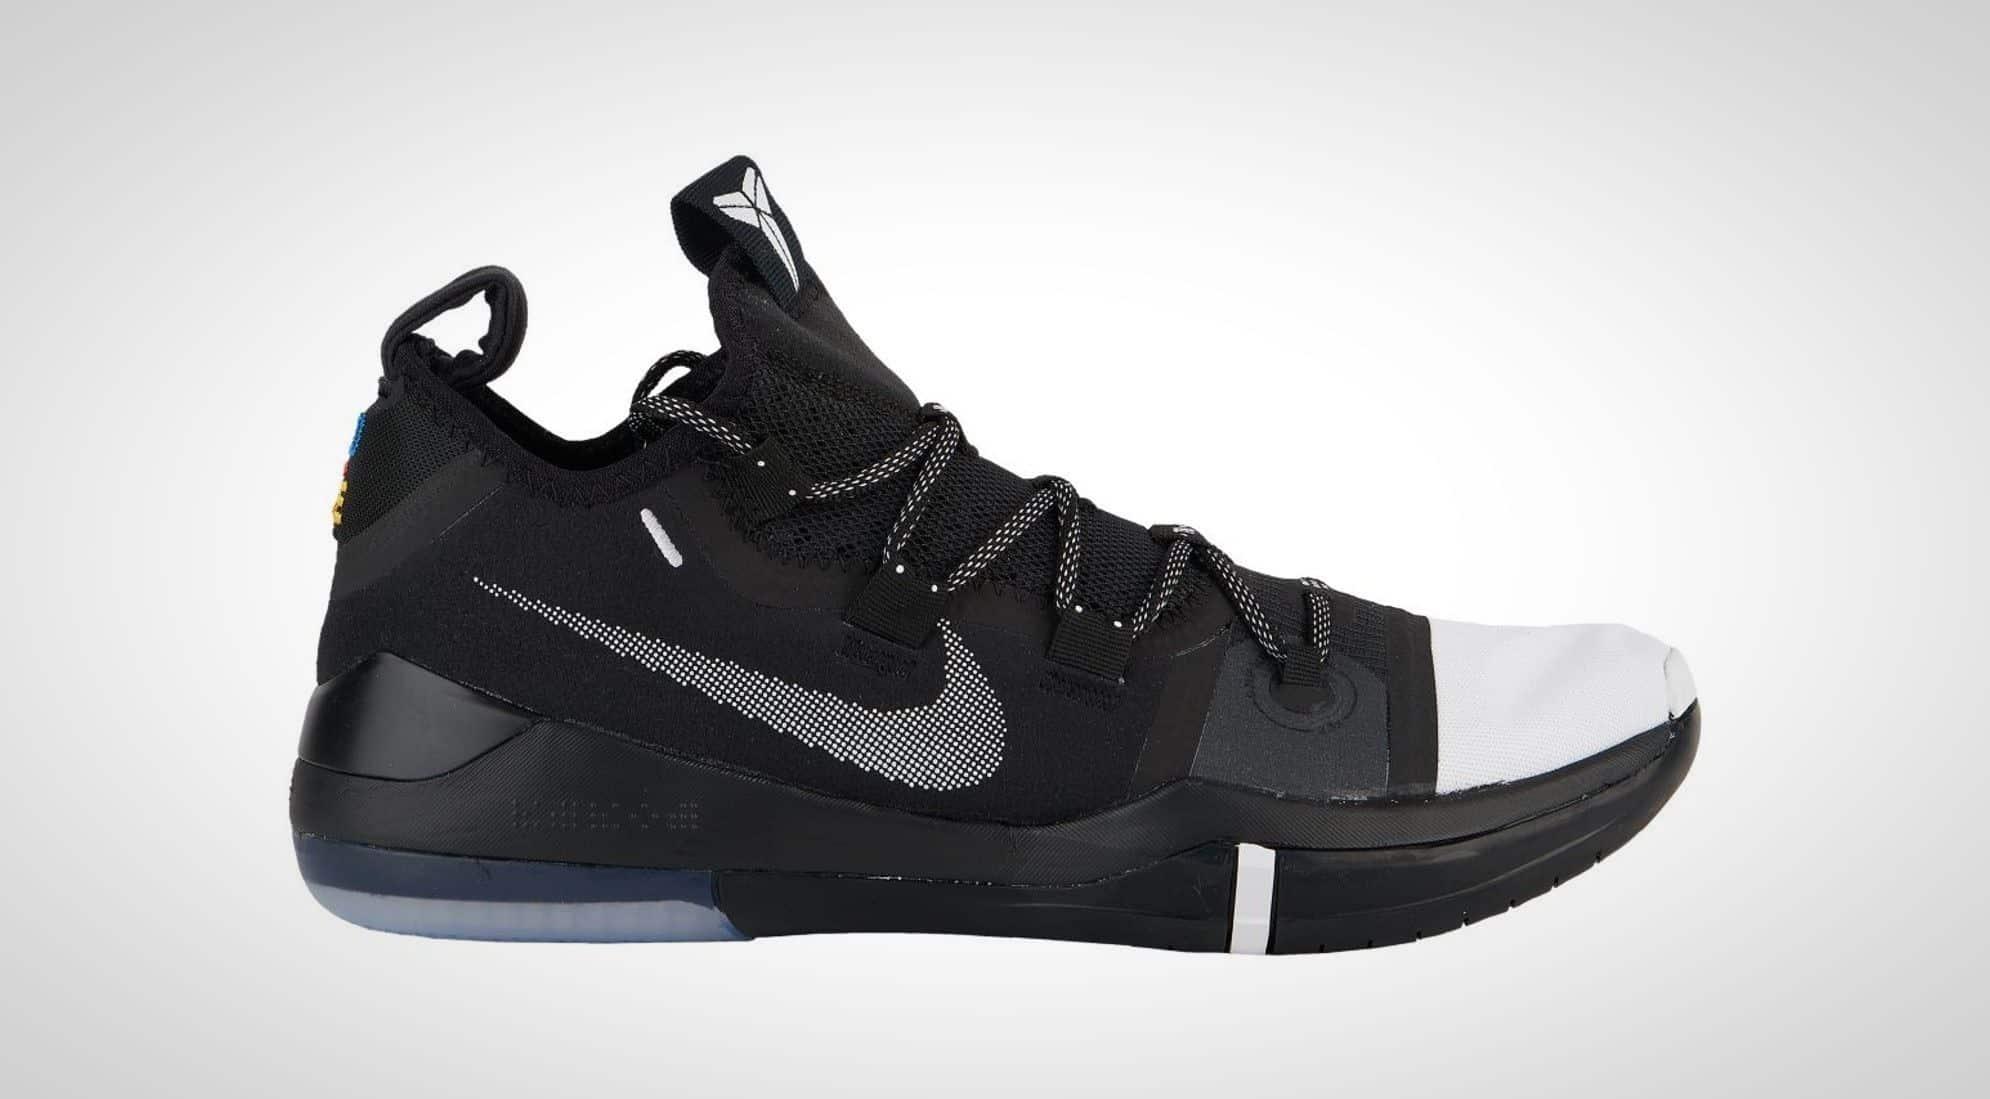 a7da4ef9c32 Nike Kobe AD Shoe Review - BestOutdoorBasketball